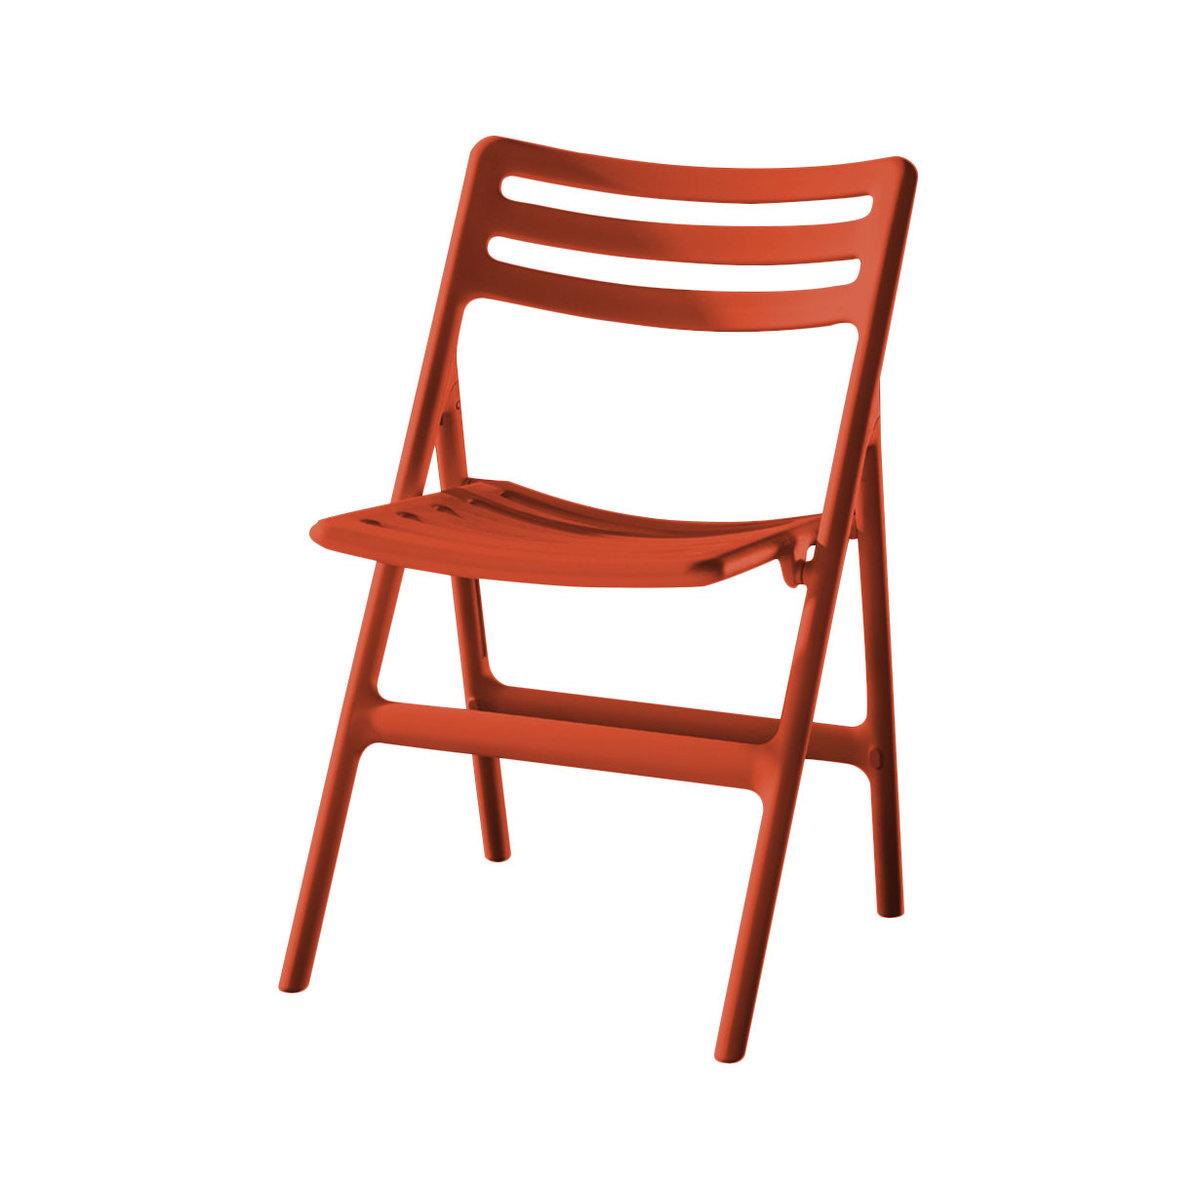 Folding air chair by magis lovethesign for Magis chair